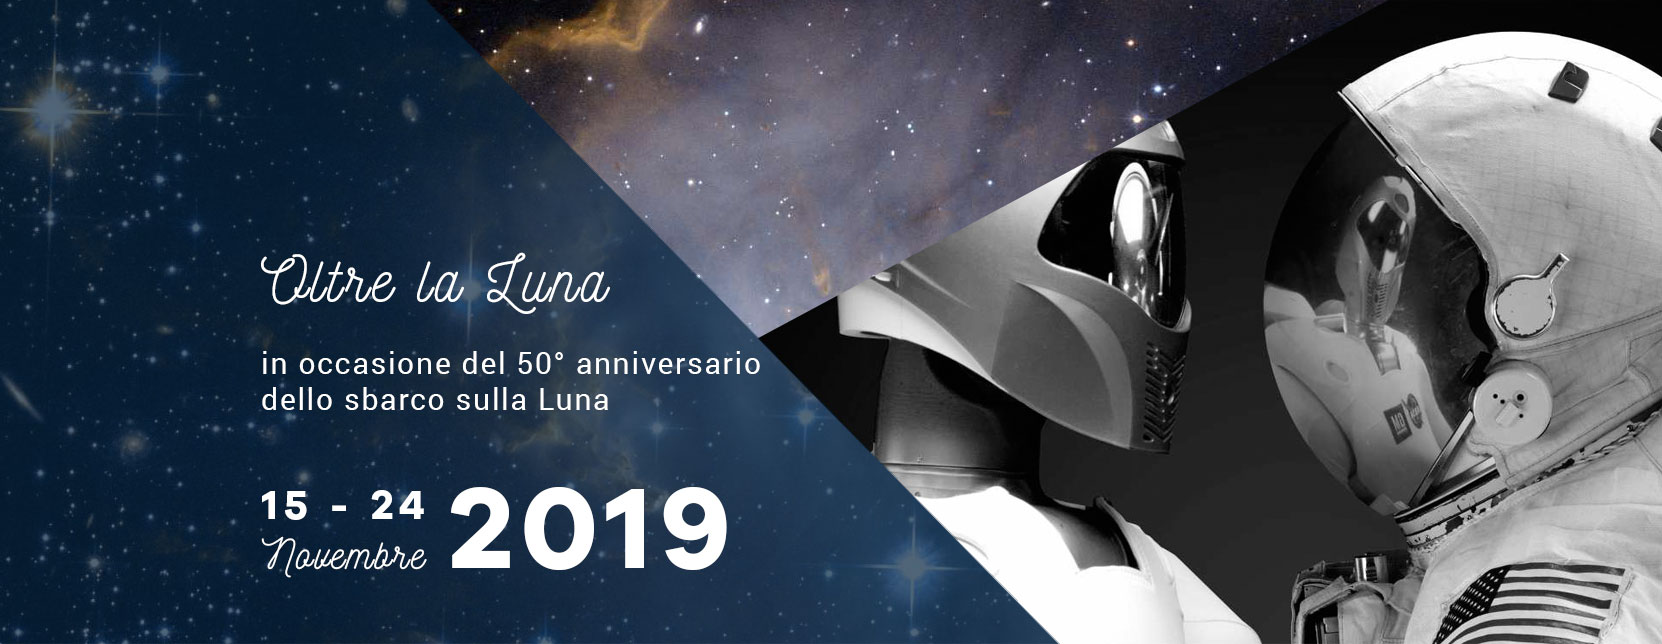 festival scienza verona 2019 - Oltre la Luna